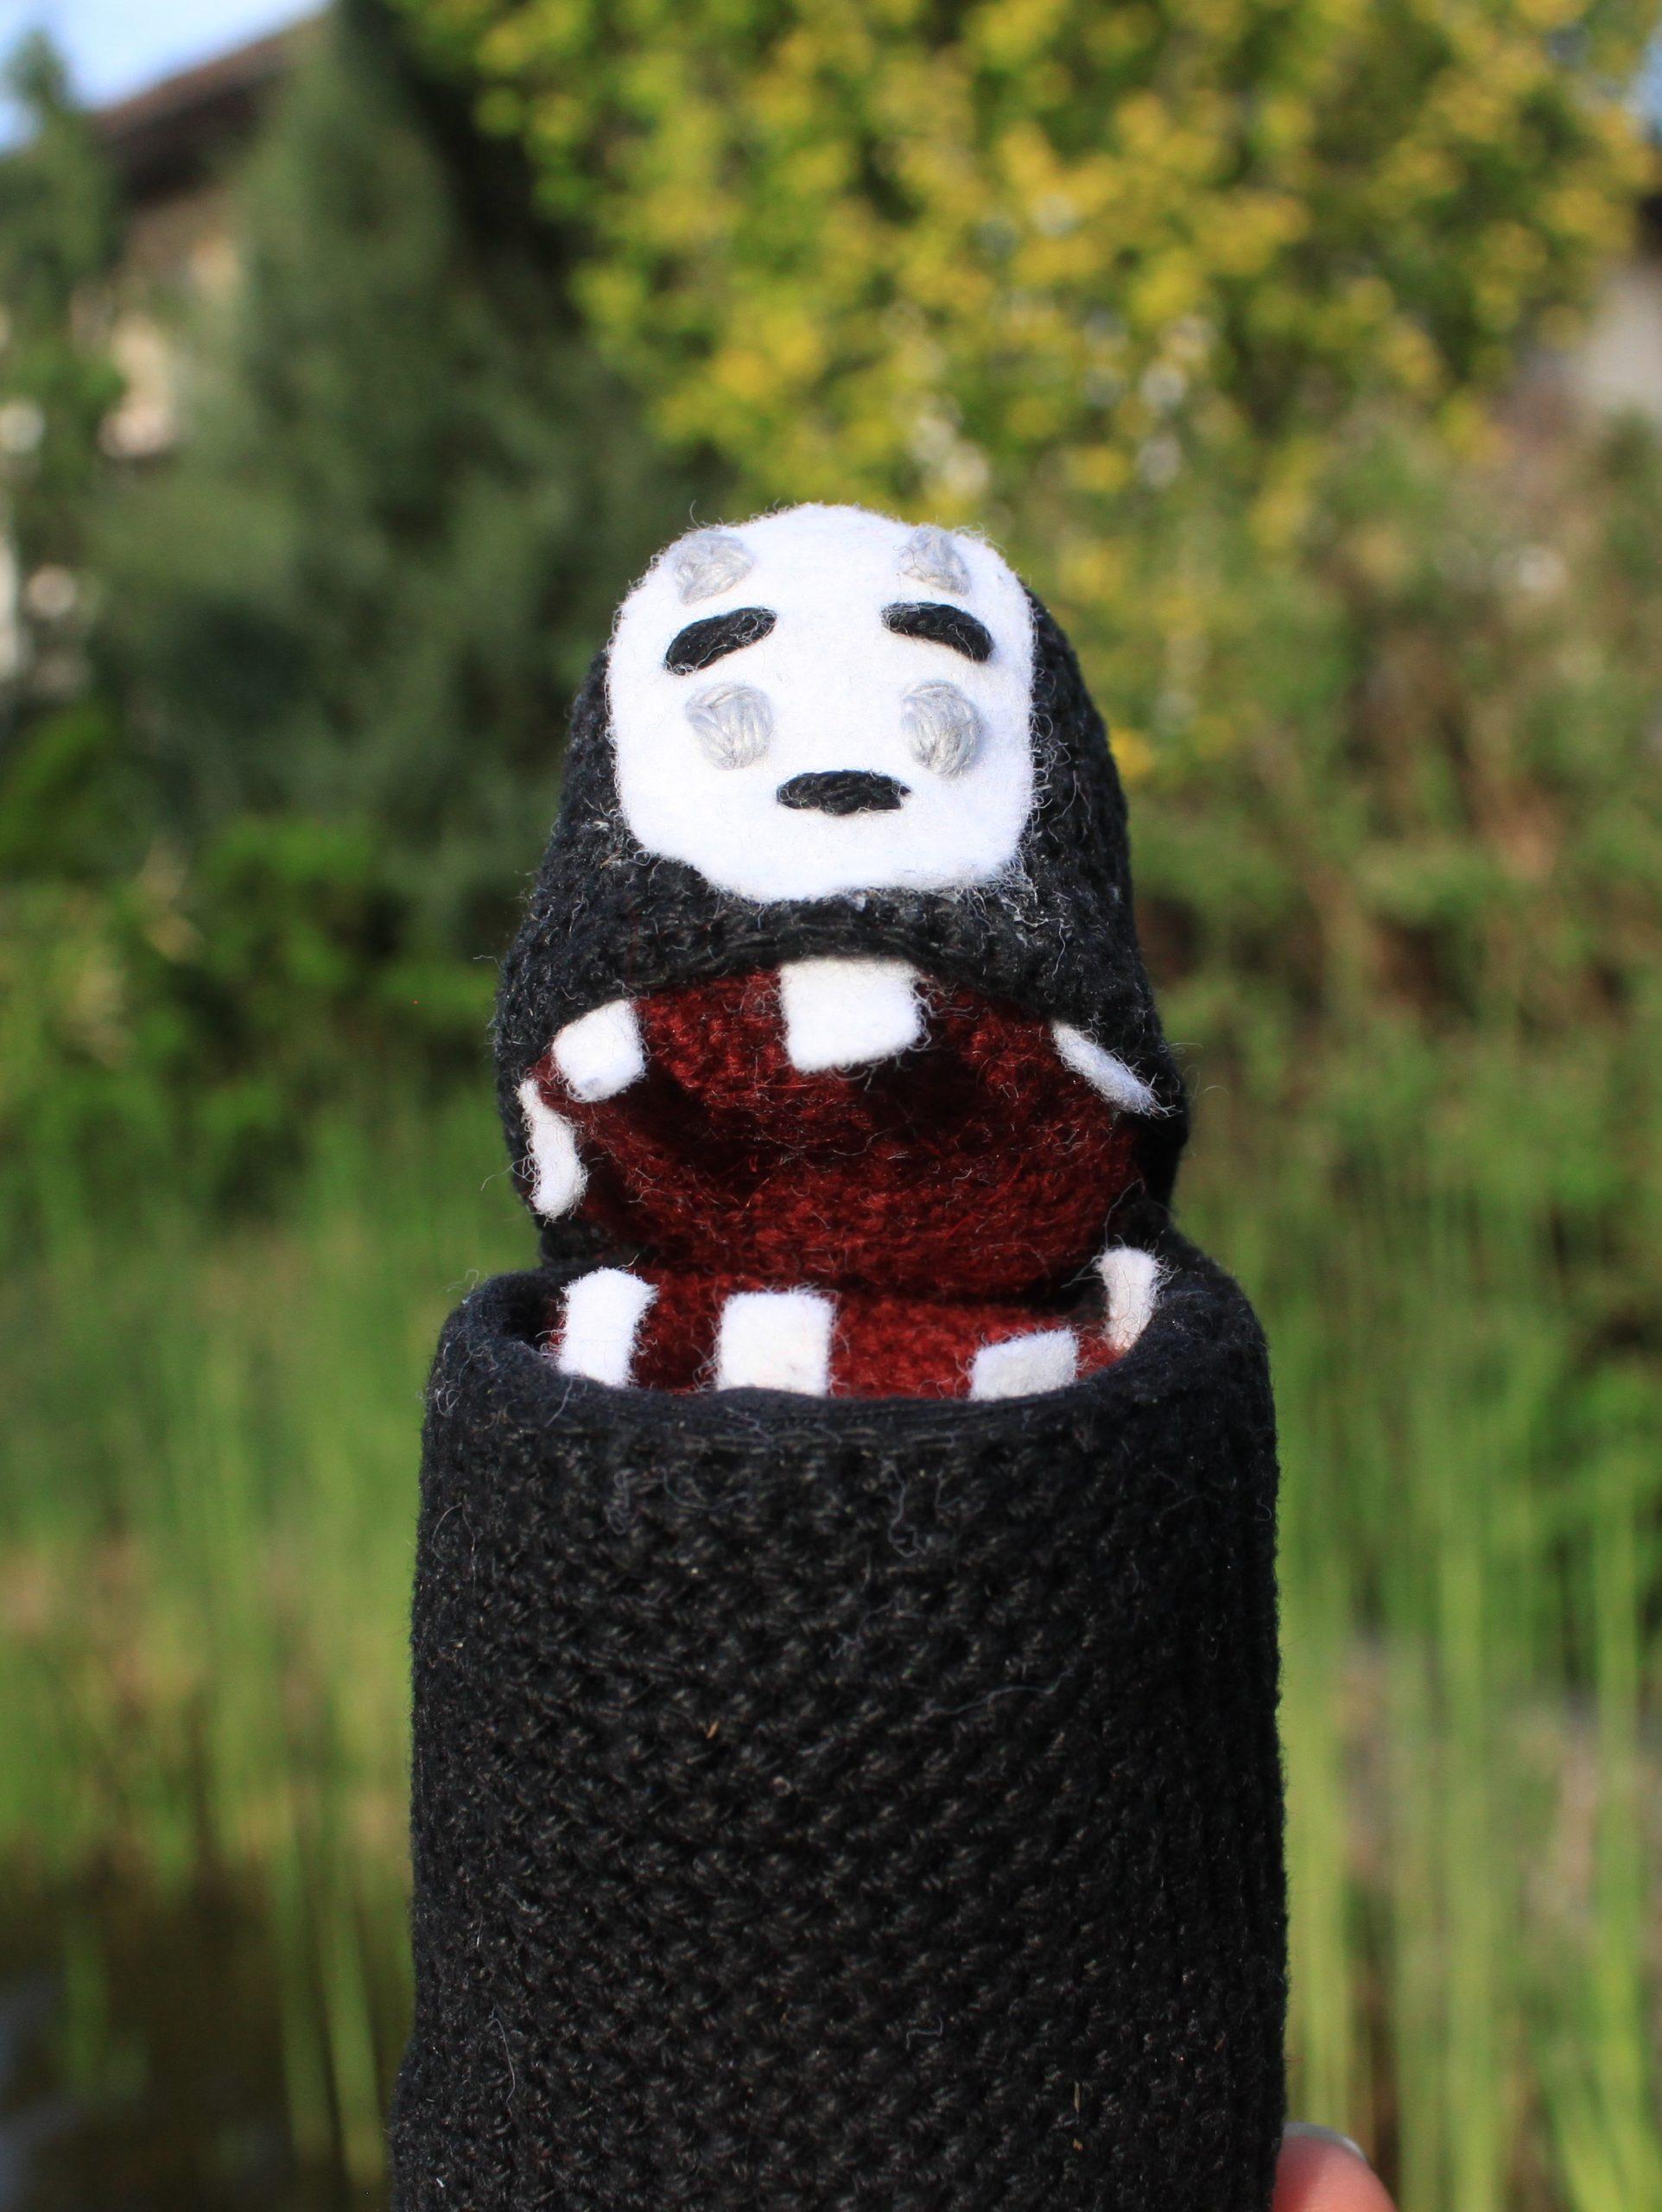 No-Face from Spirited Away Crochet Amigurumi Figure with Secret Storage